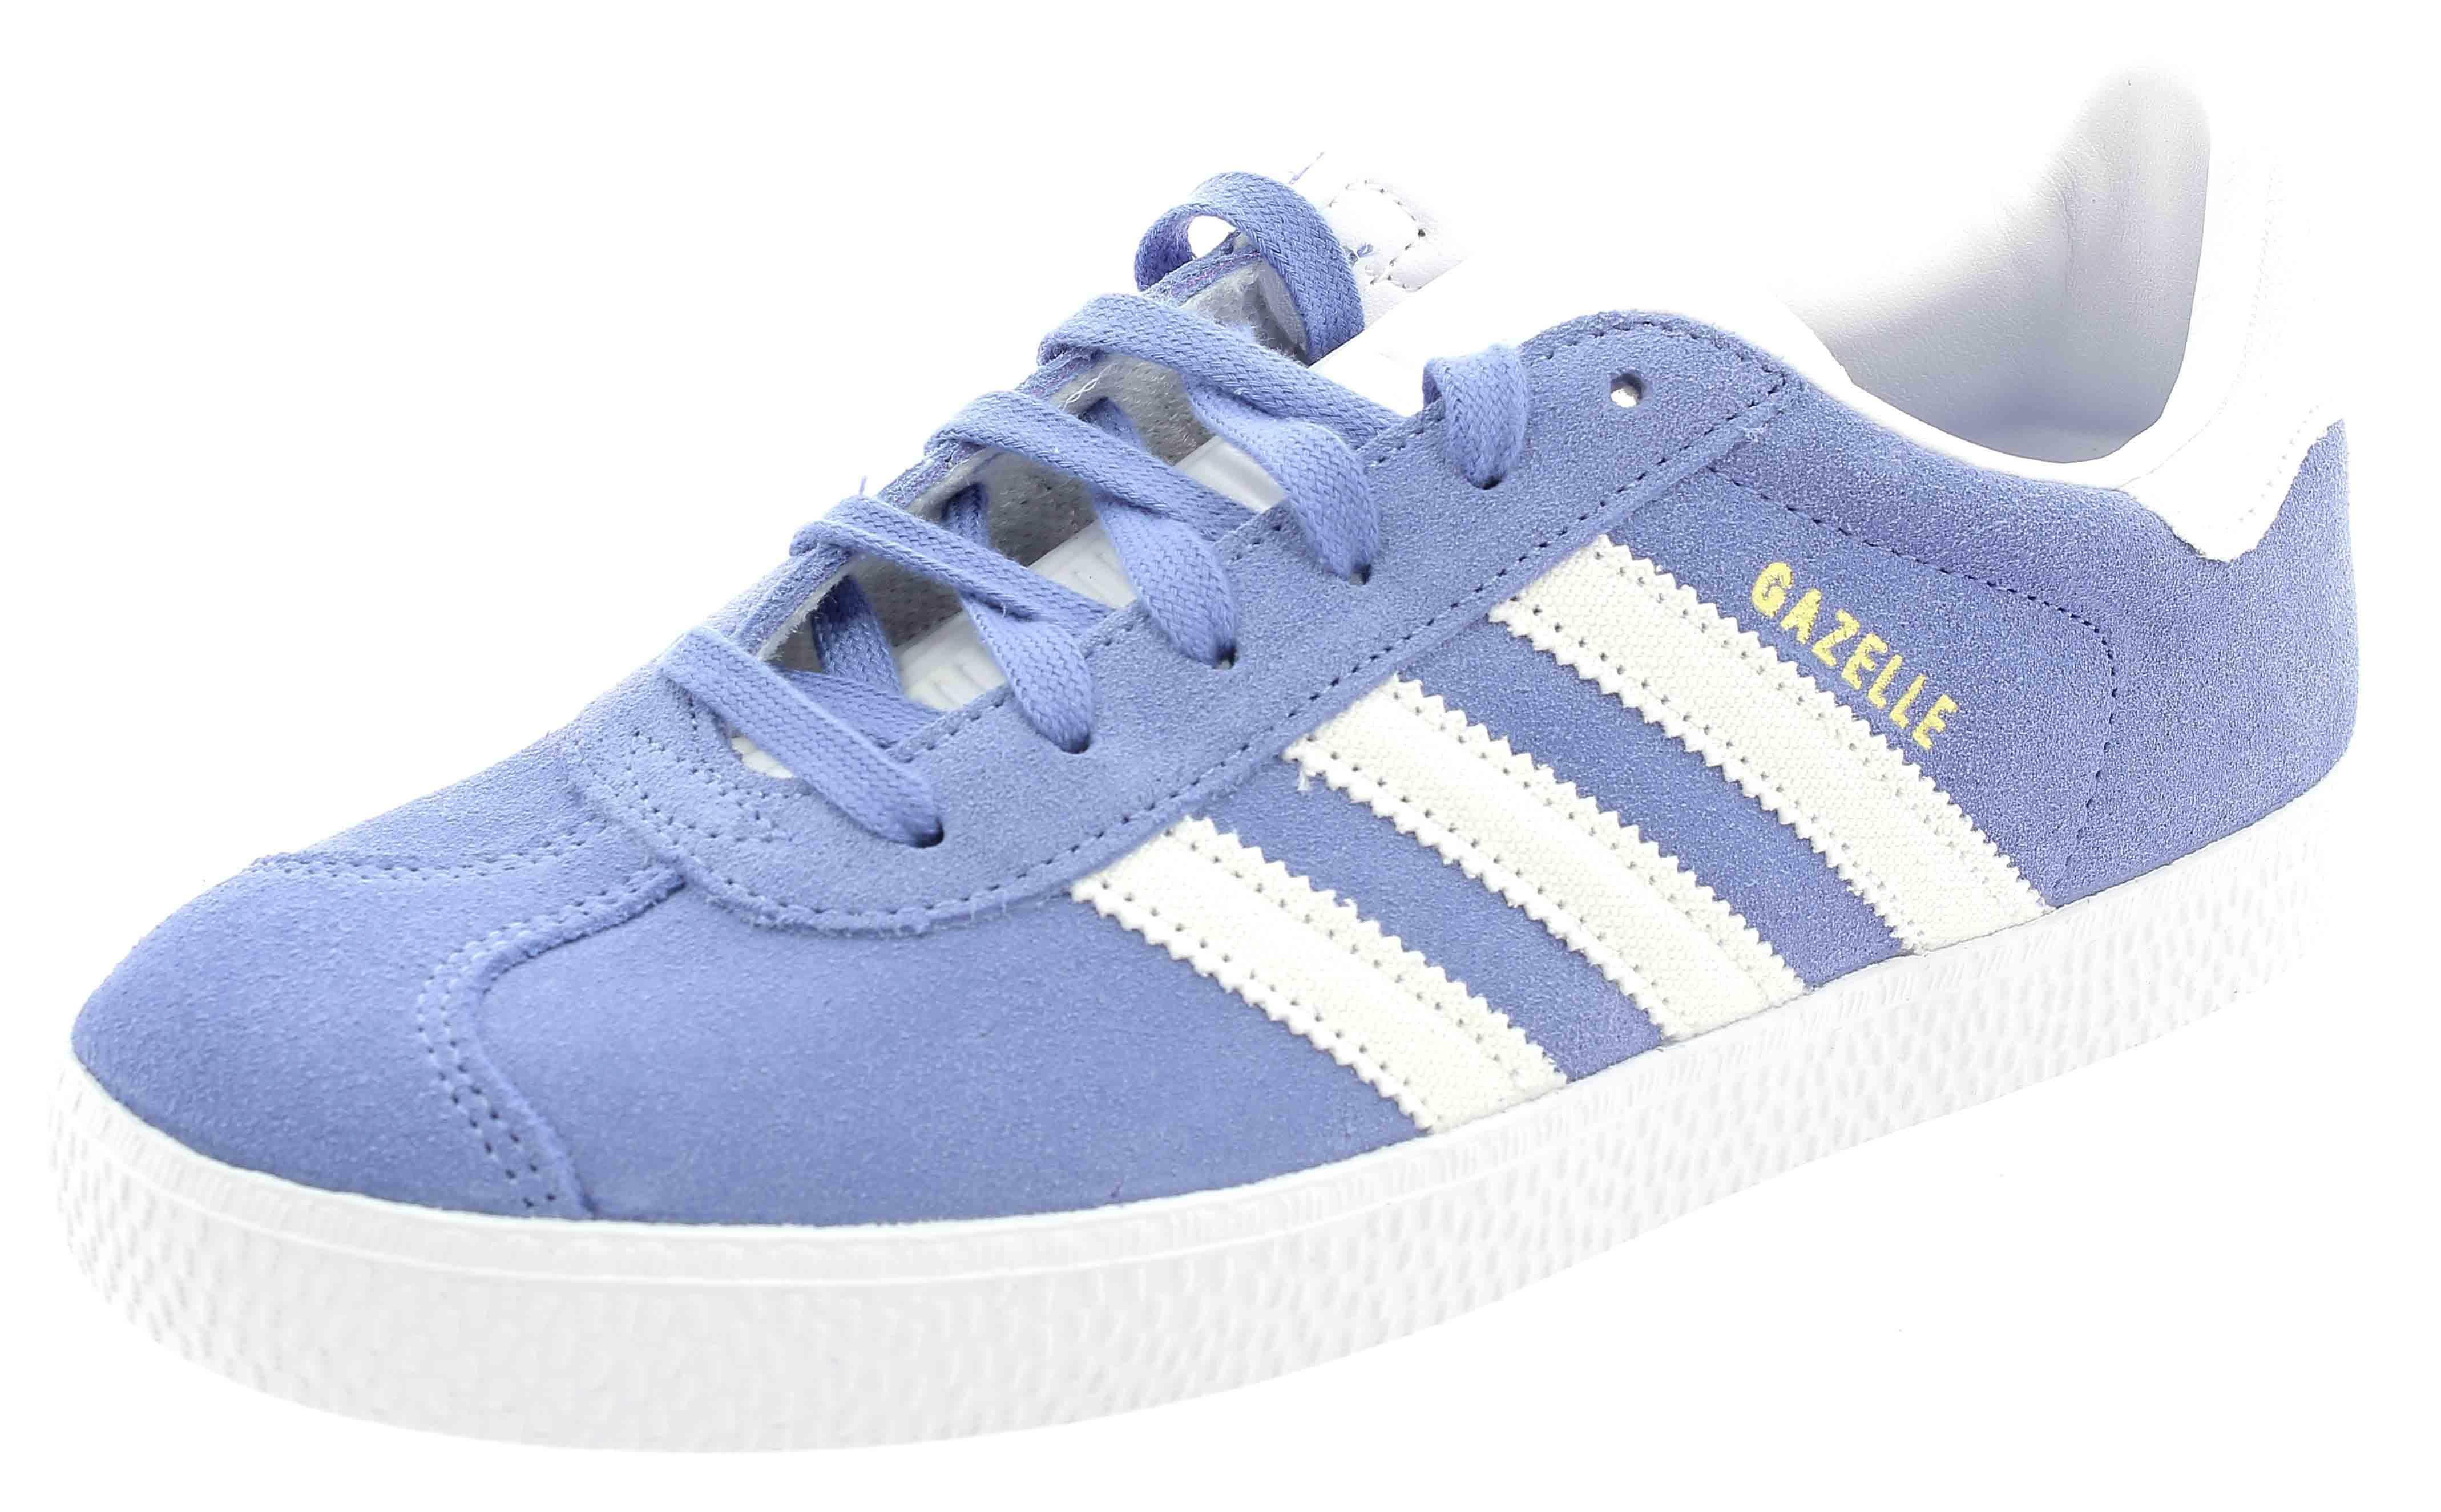 A Abbigliamento Ferrara Vendita Saqc54r3jl Scarpe Adidas In